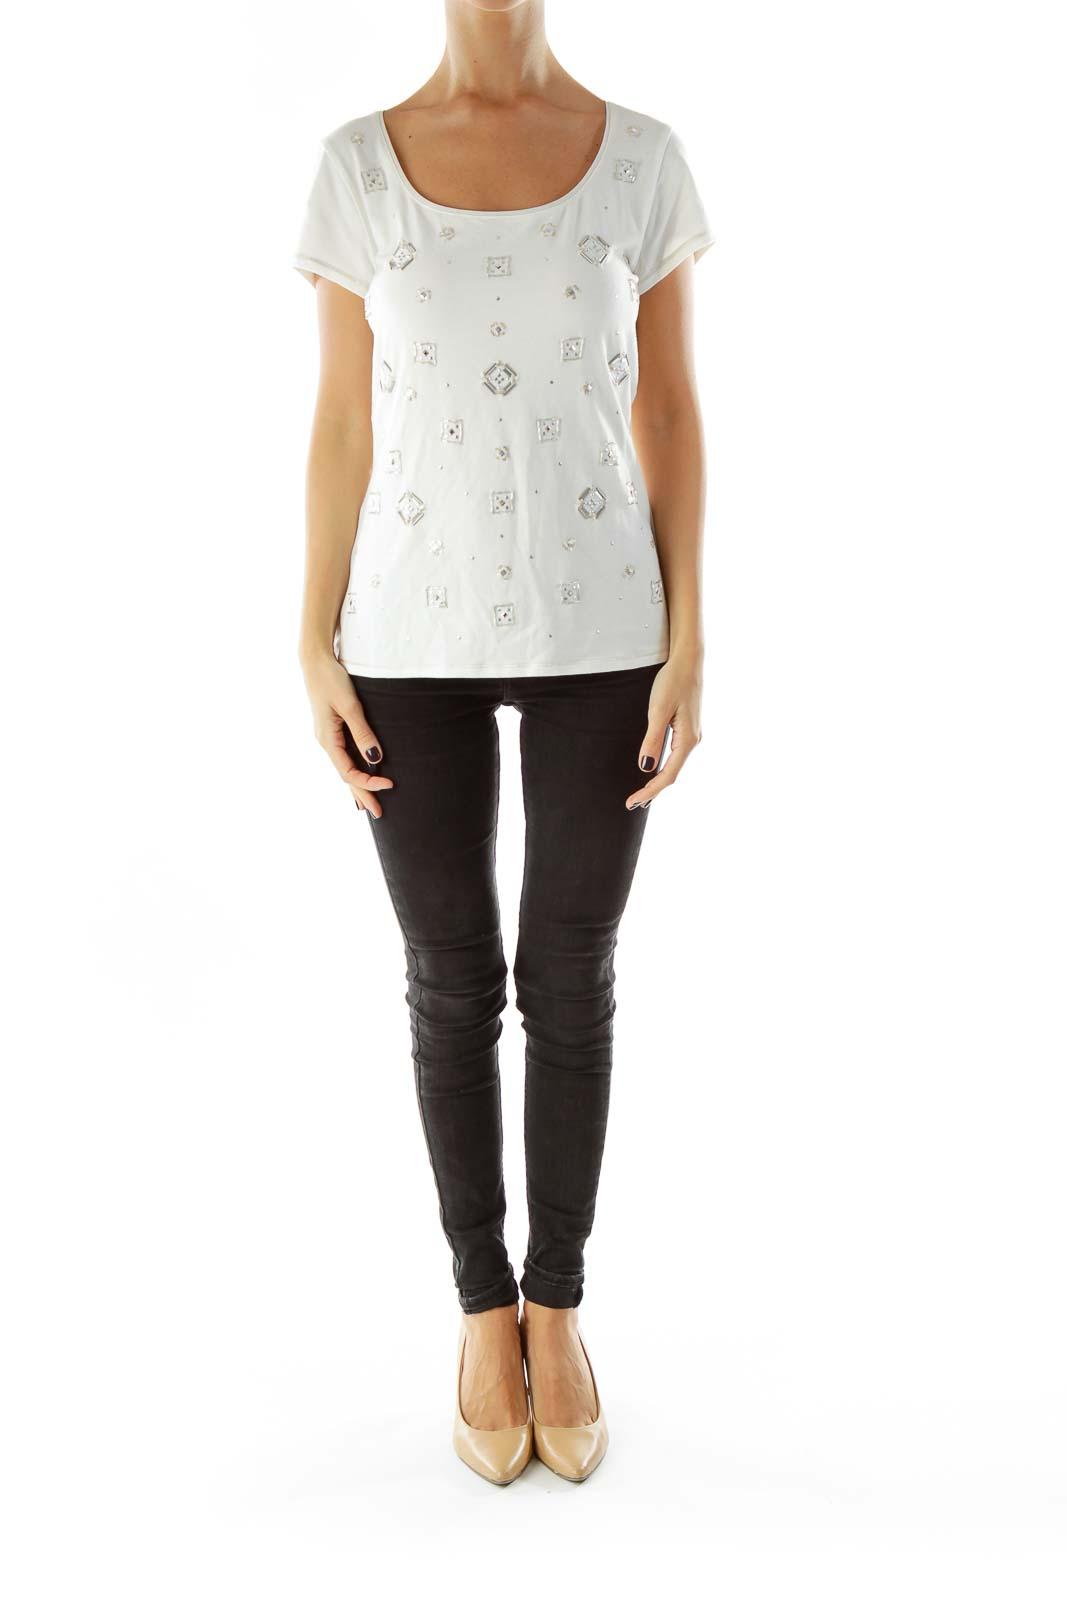 White silver Beaded Geometric T-shirt